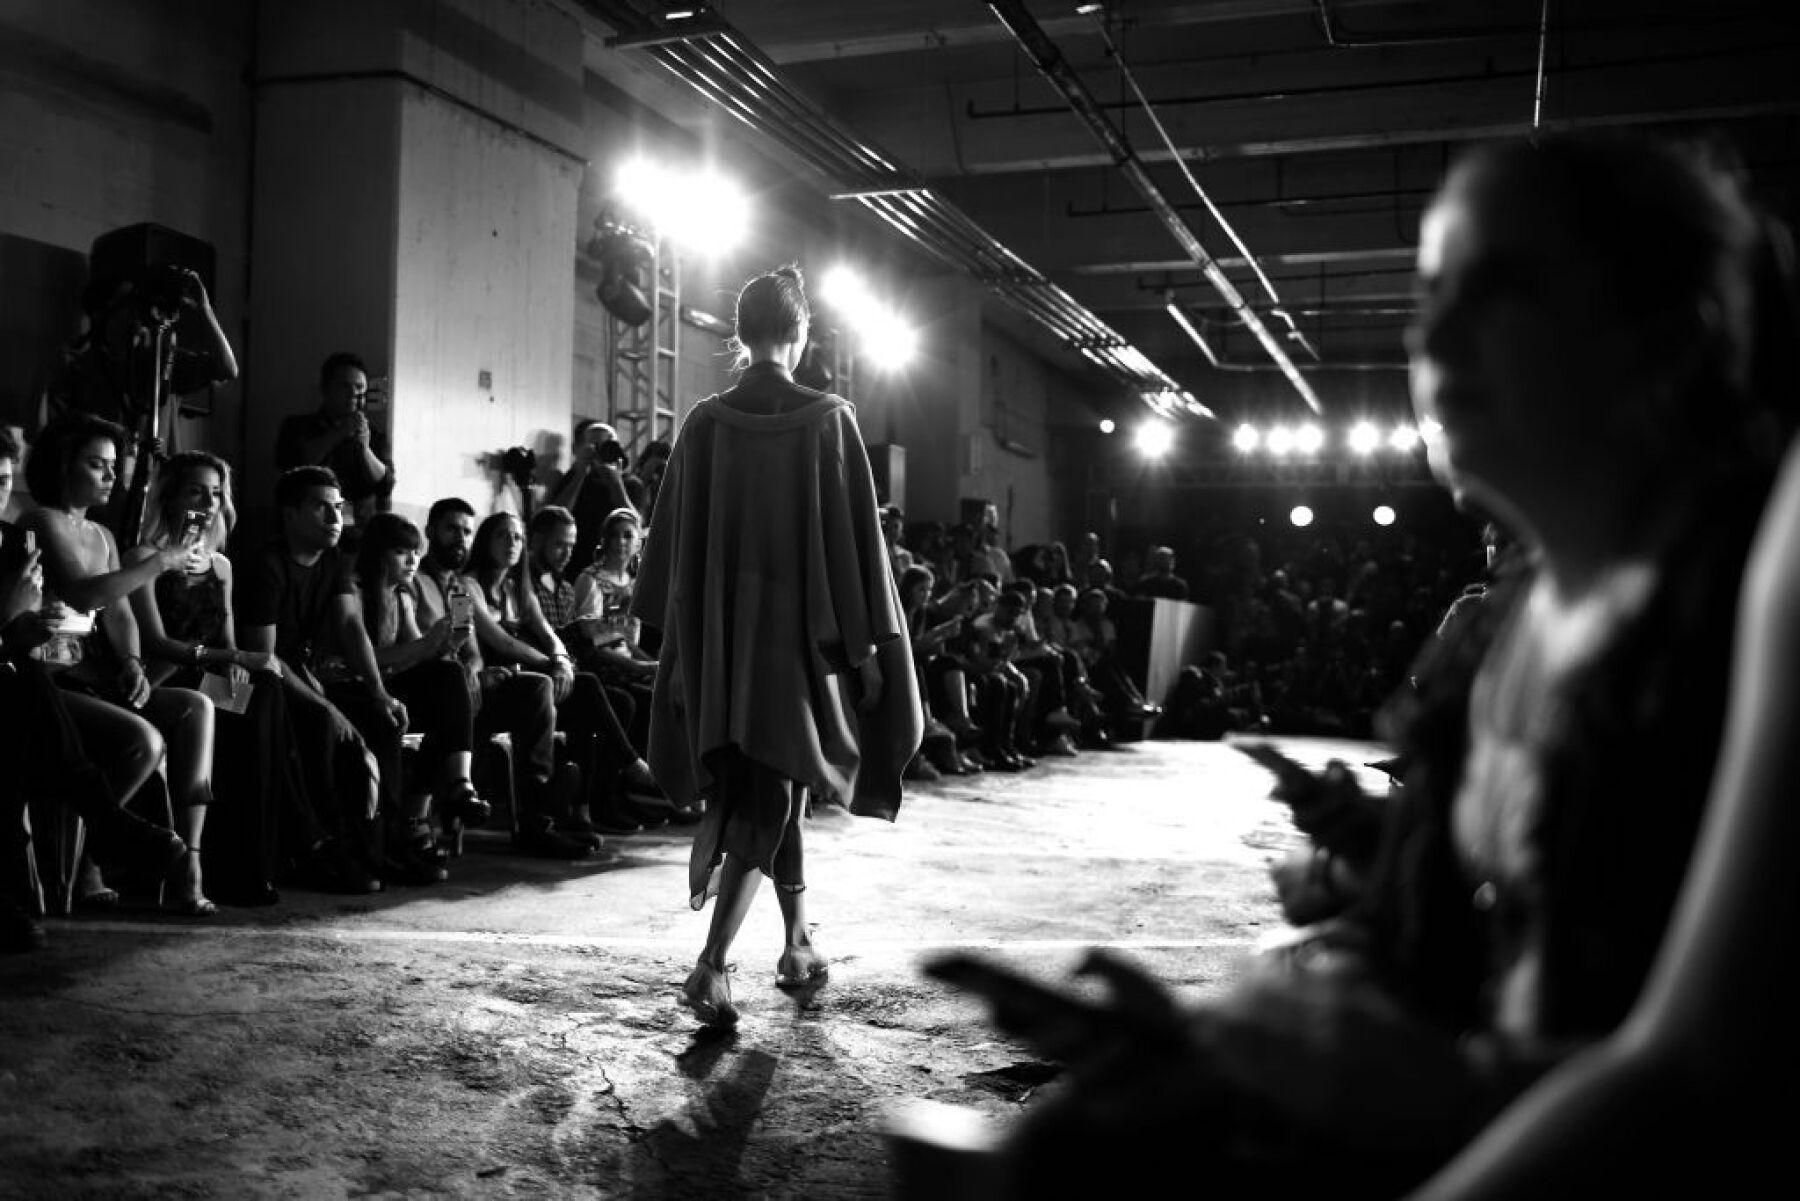 Mercedes Benz Fashion Week Mexico A/W 2017 - Day 5